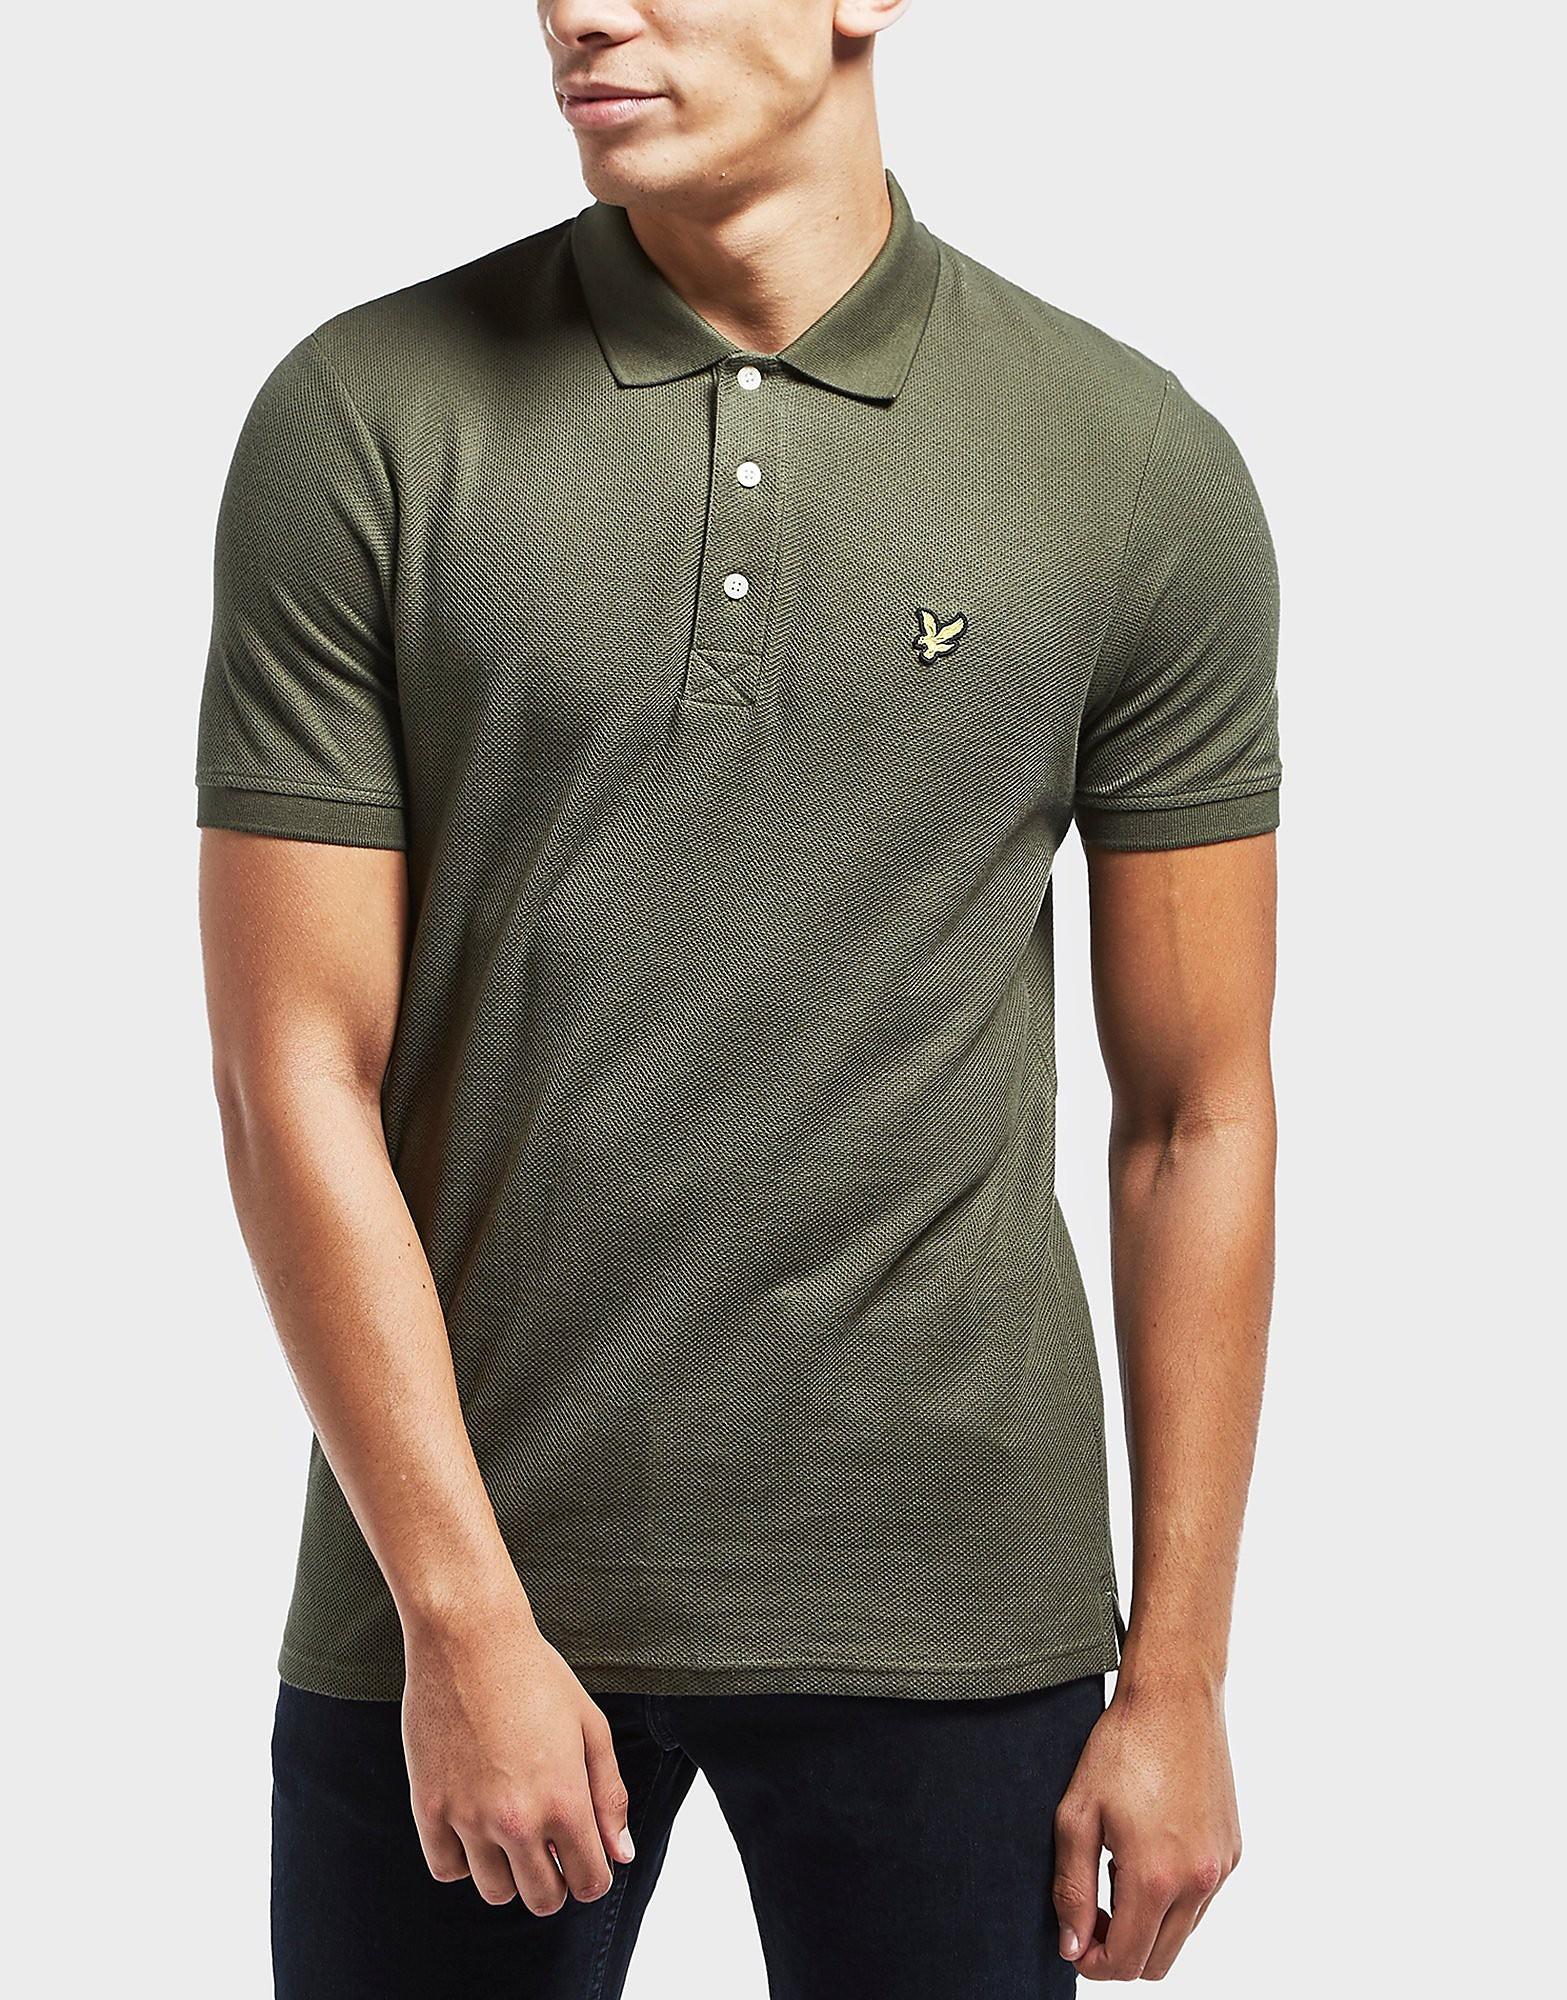 Lyle & Scott Honeycomb Short Sleeve Polo Shirt